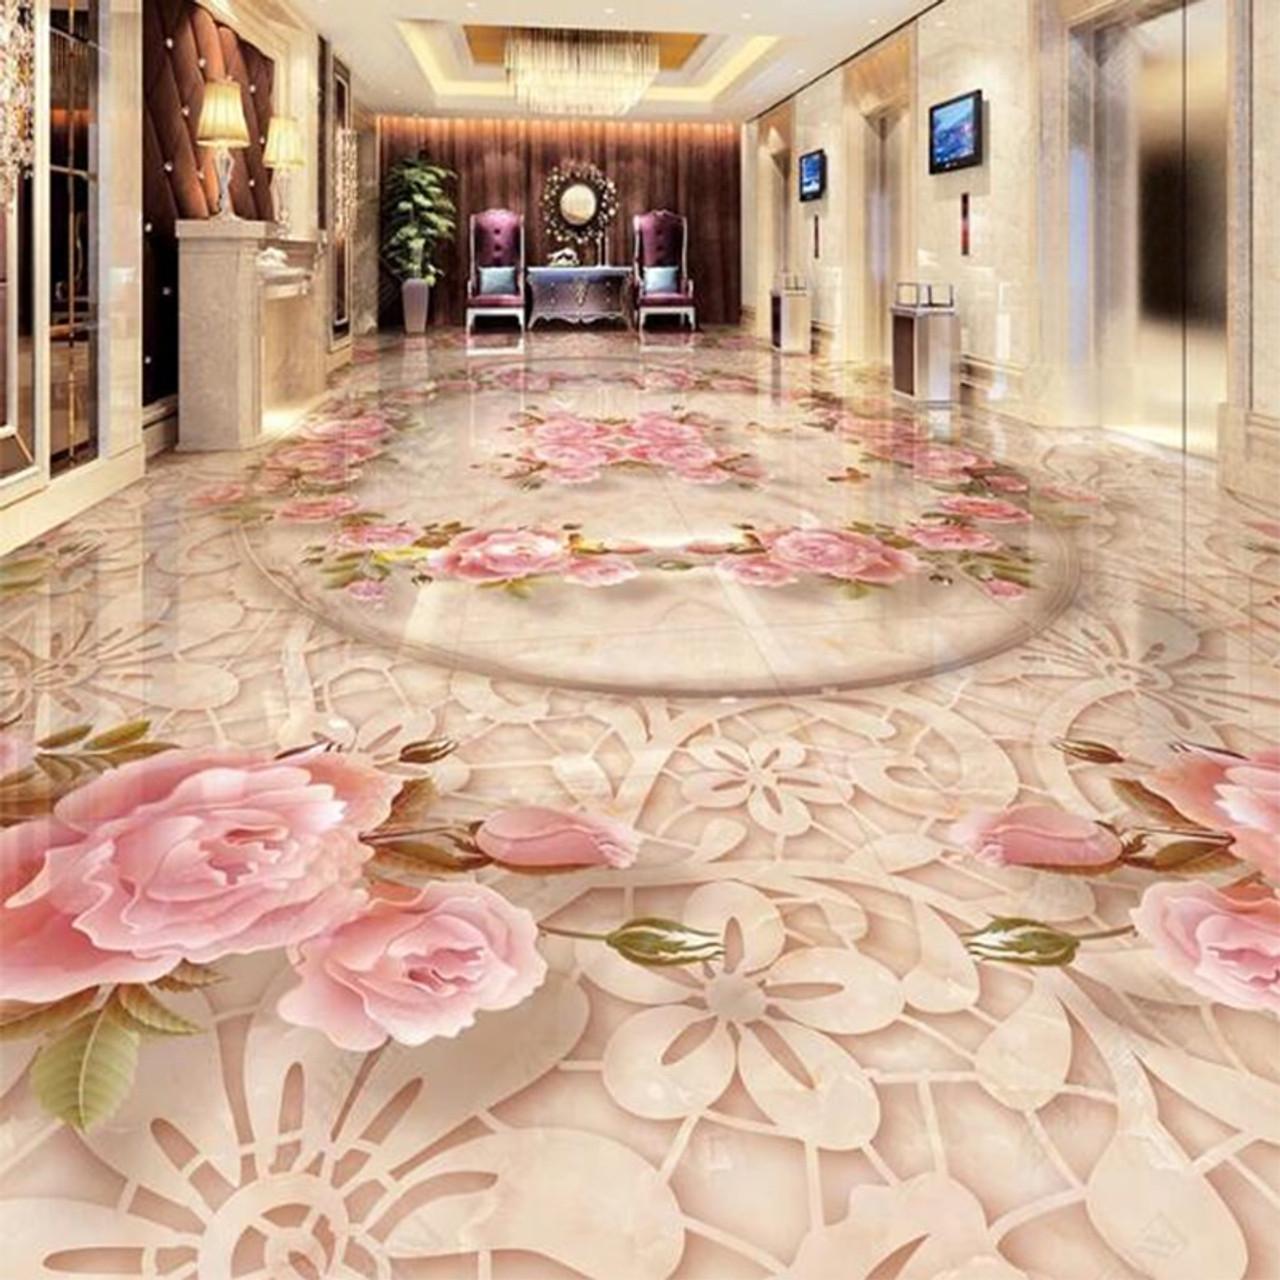 3d Wallpaper European Style Marble Floral Floor Sticker Living Room Bedroom Pvc Self Adhesive Waterproof Murals Wall Paper Decor